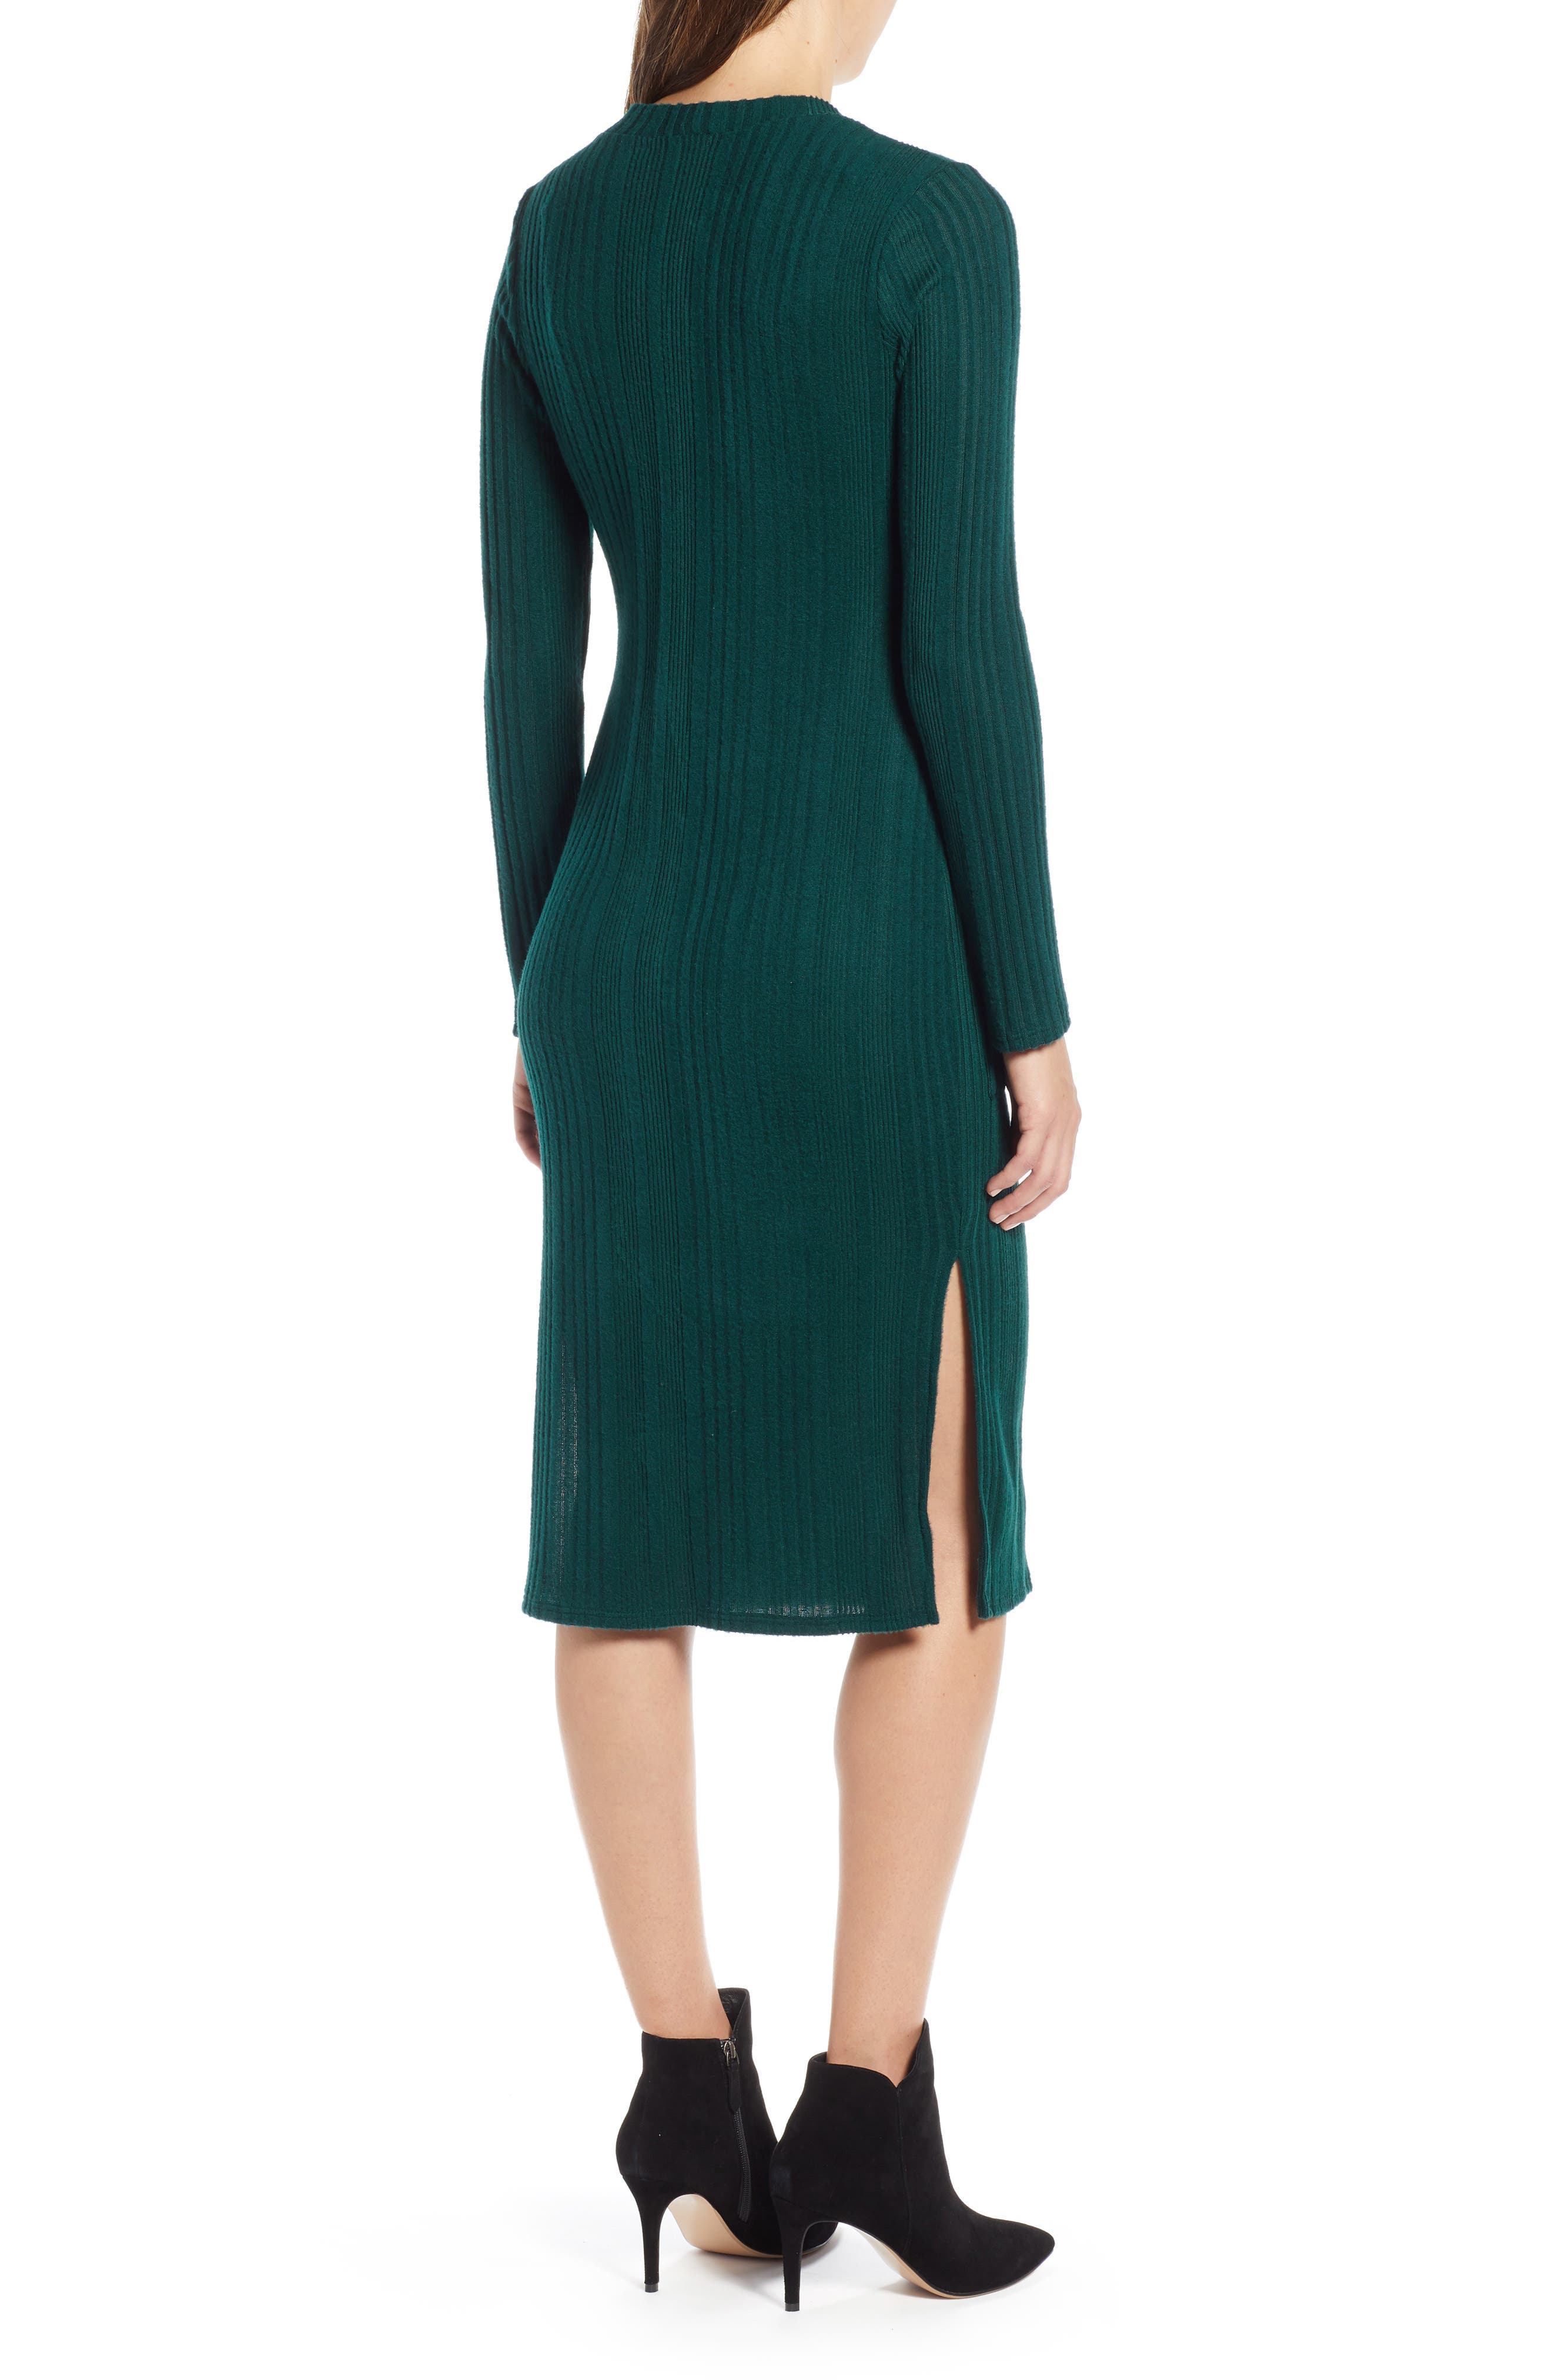 SOCIALITE,                             Sweater Dress,                             Alternate thumbnail 2, color,                             300